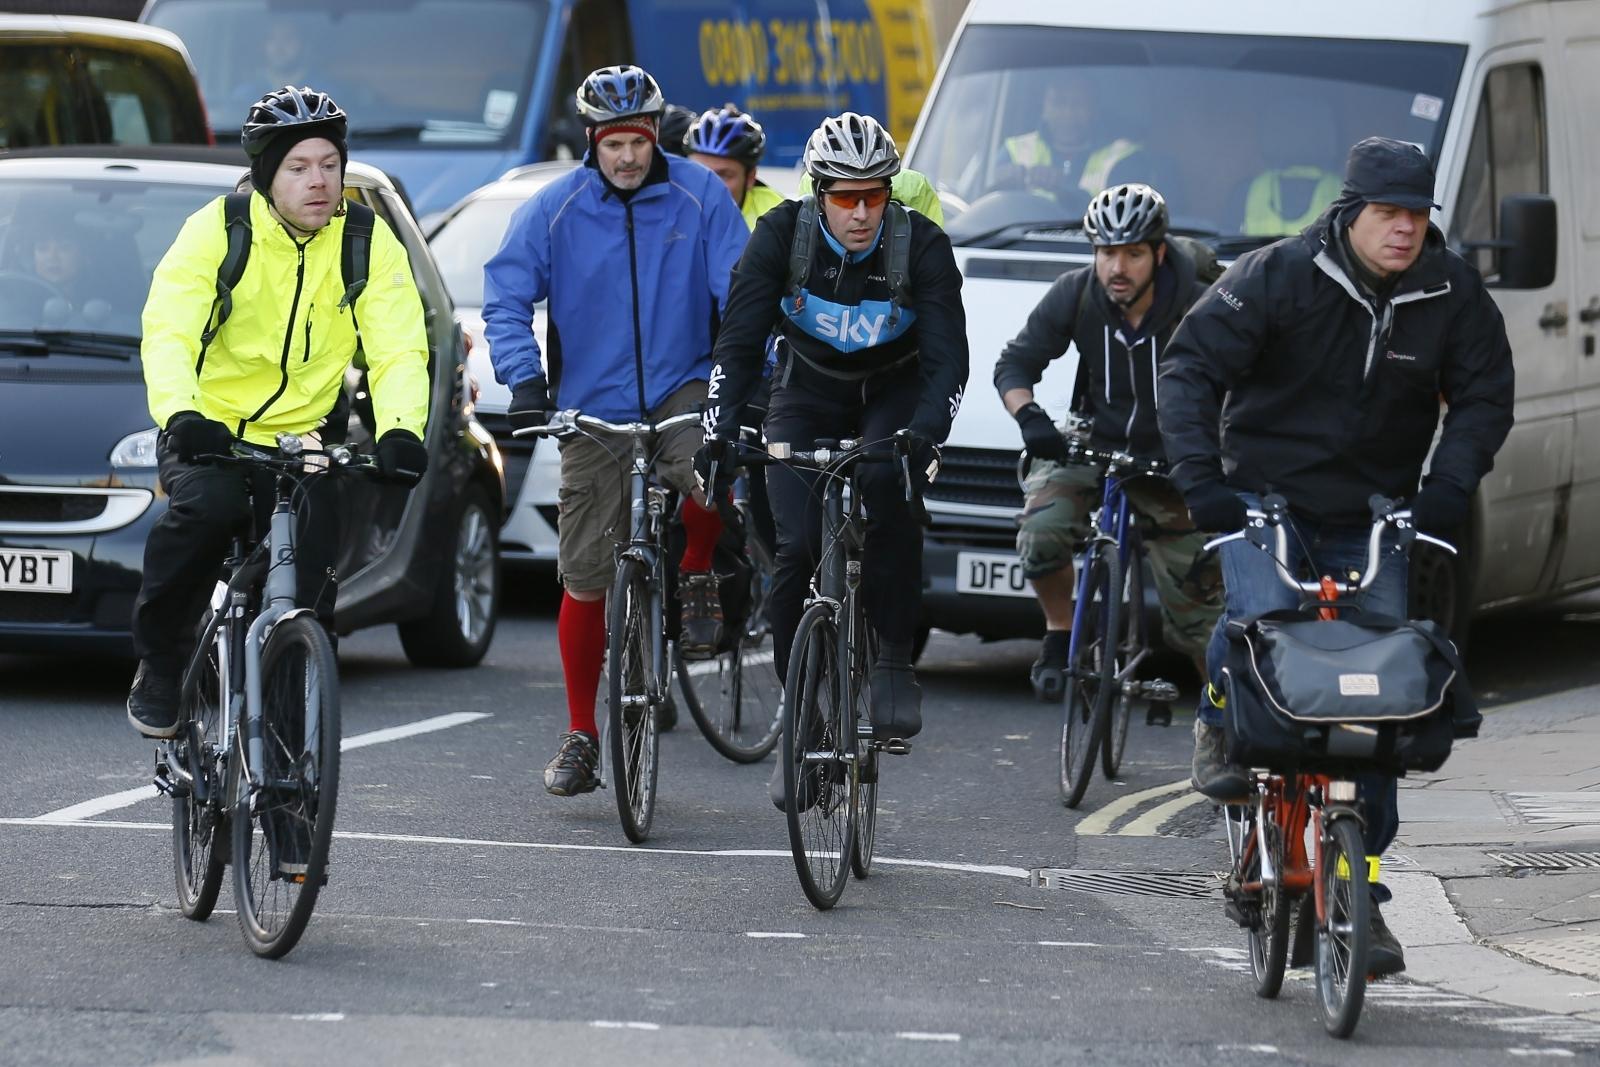 Government Raises Spectre of Compulsory Bike Helmet Laws